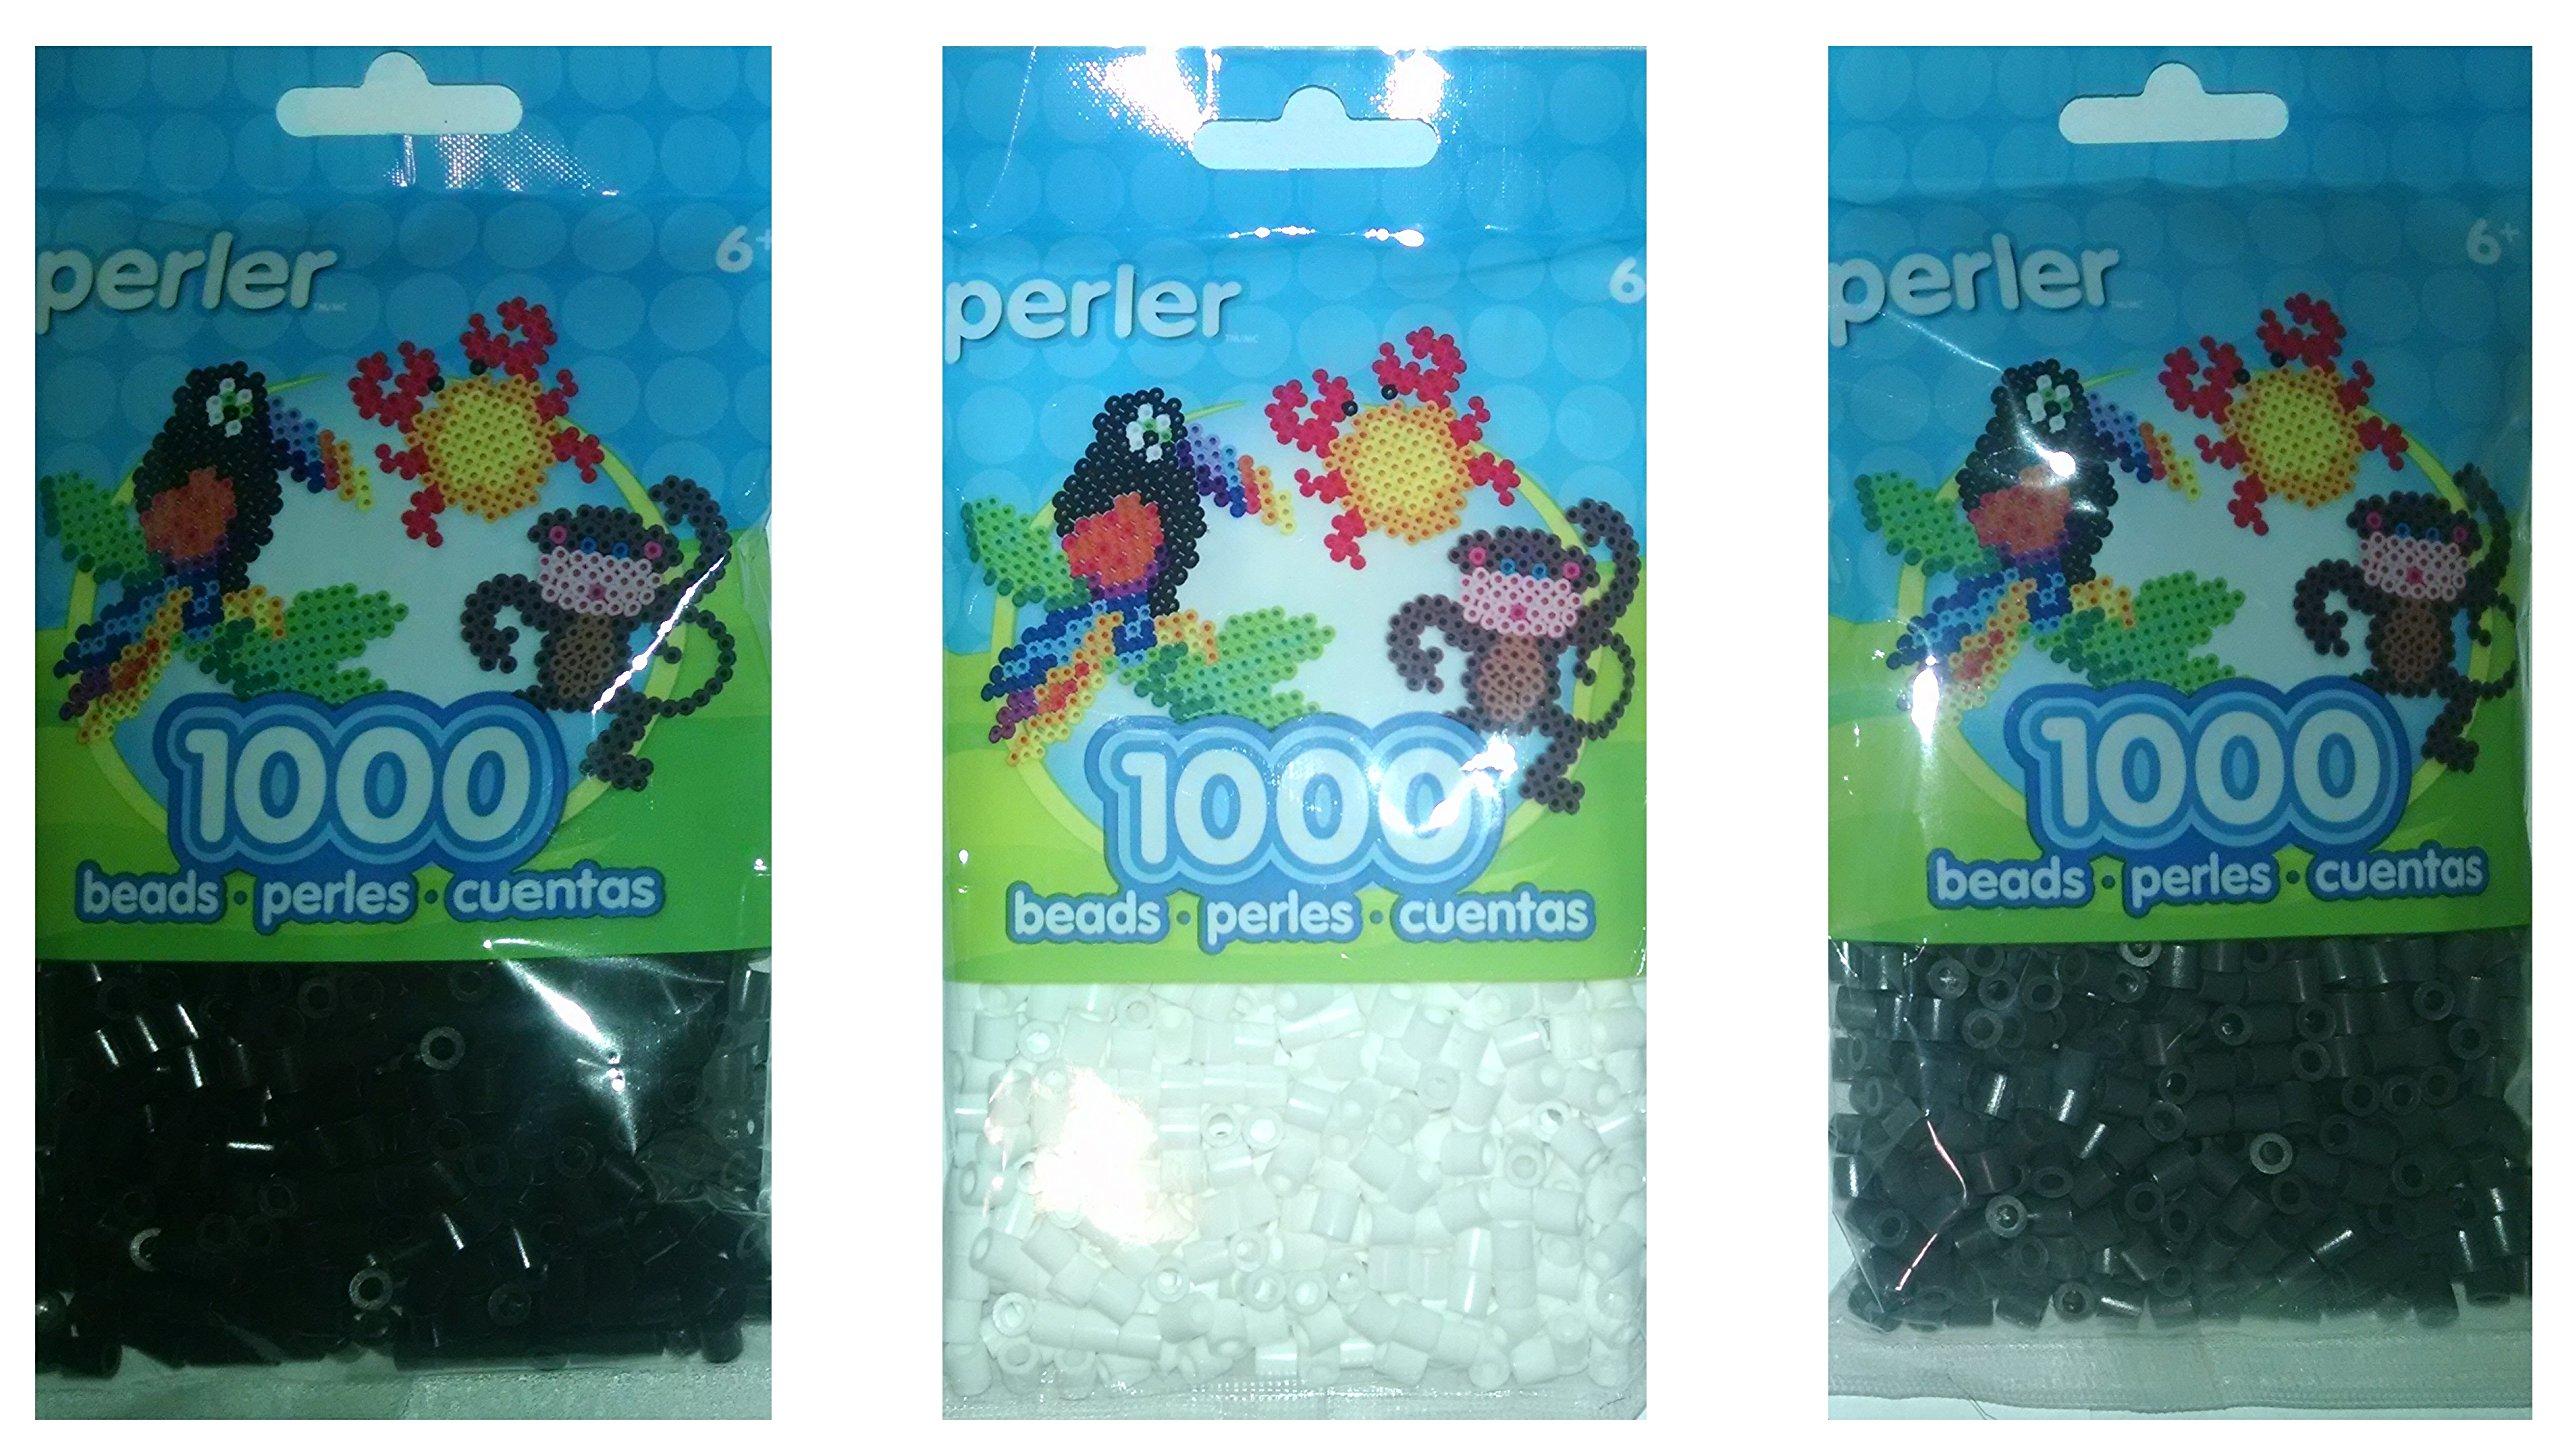 Perler Bead Bag Group Black, White And Dark Grey 1,000 Each